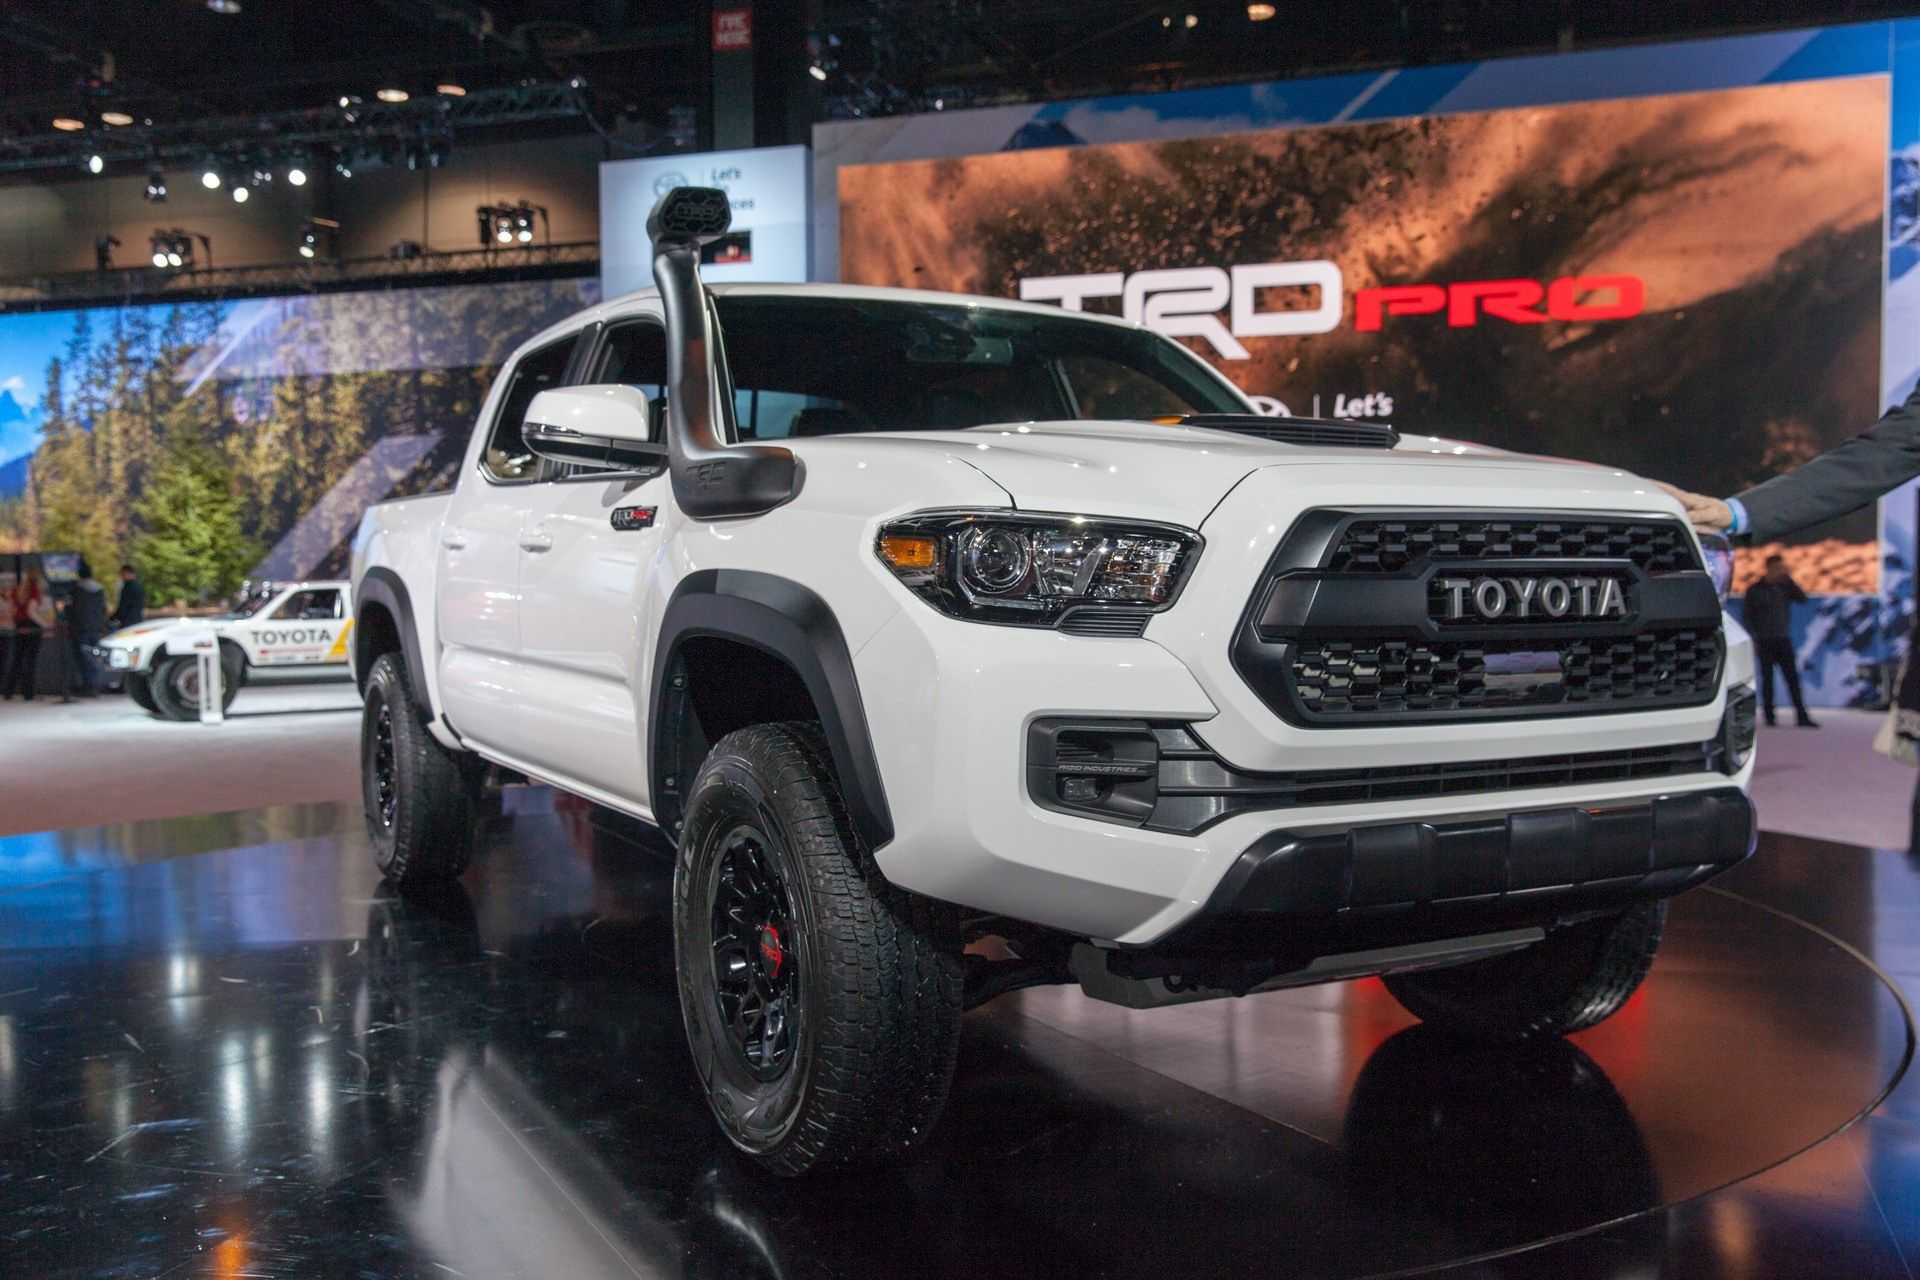 2019 Toyota Tacoma Diesel >> 2019 Toyota Tacoma Diesel Trd Pro Price Spy Shoot Toyota